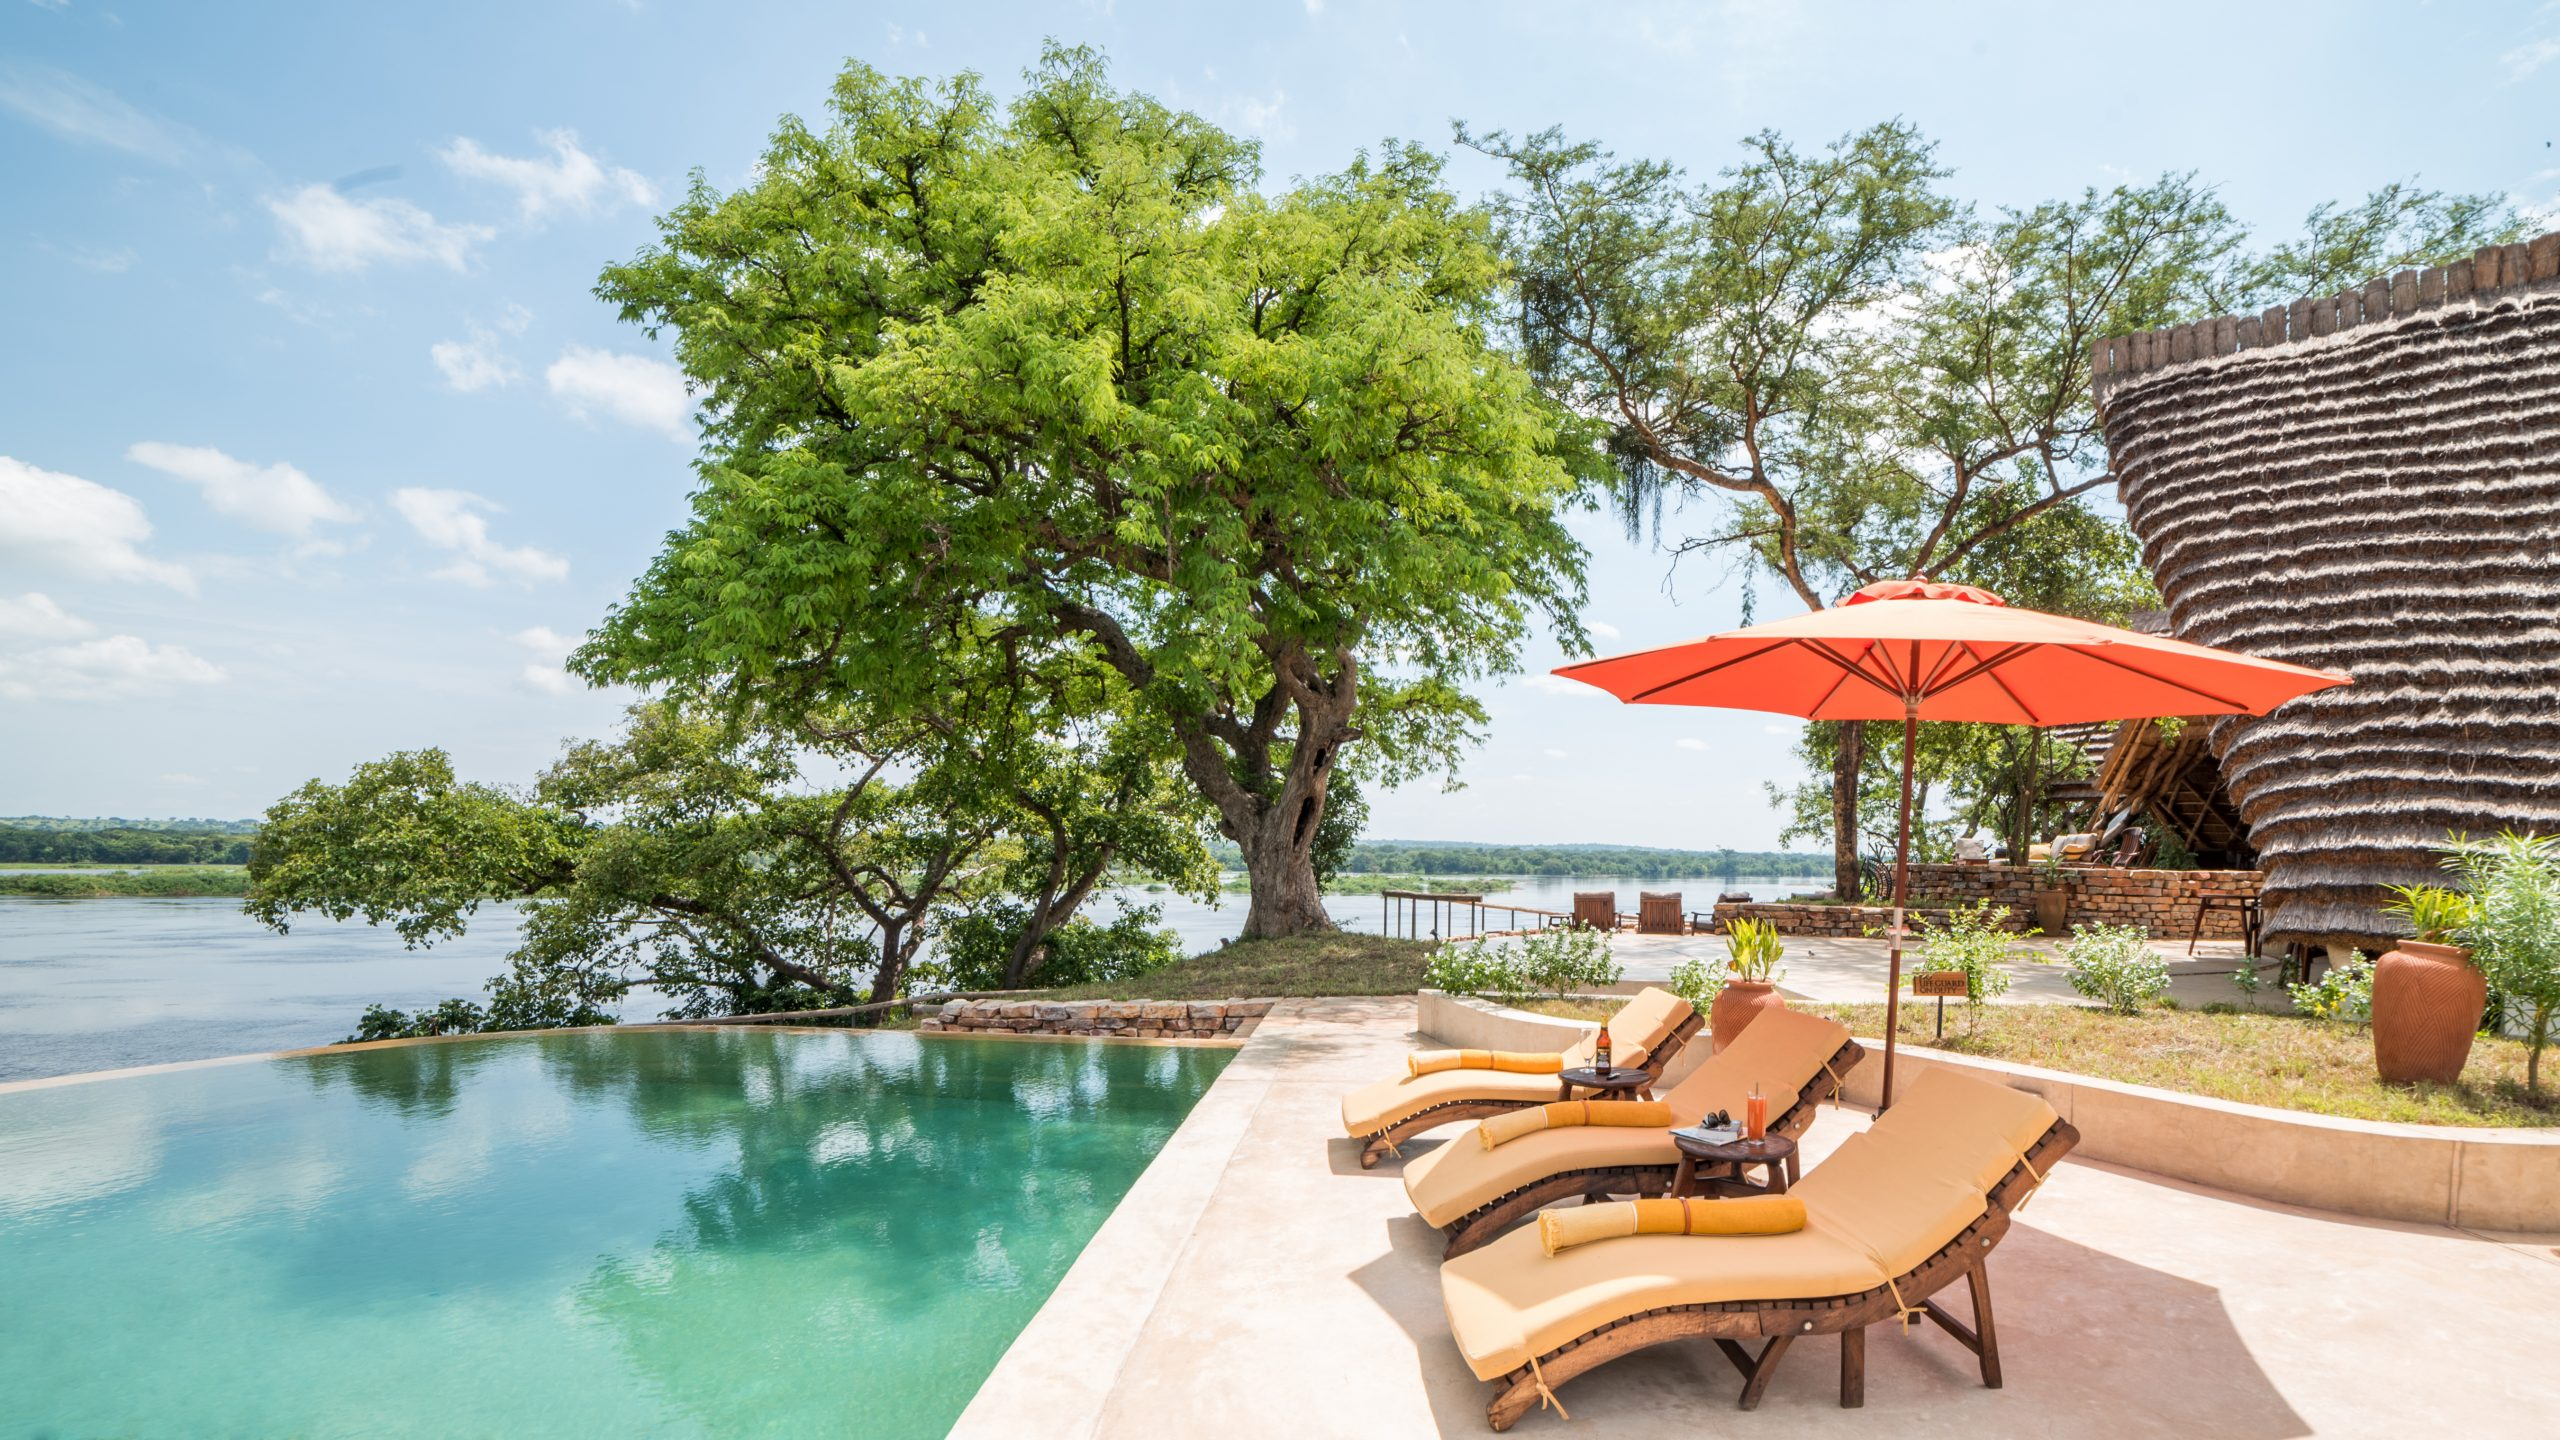 Nile Safari Lodge Infinity Pool.